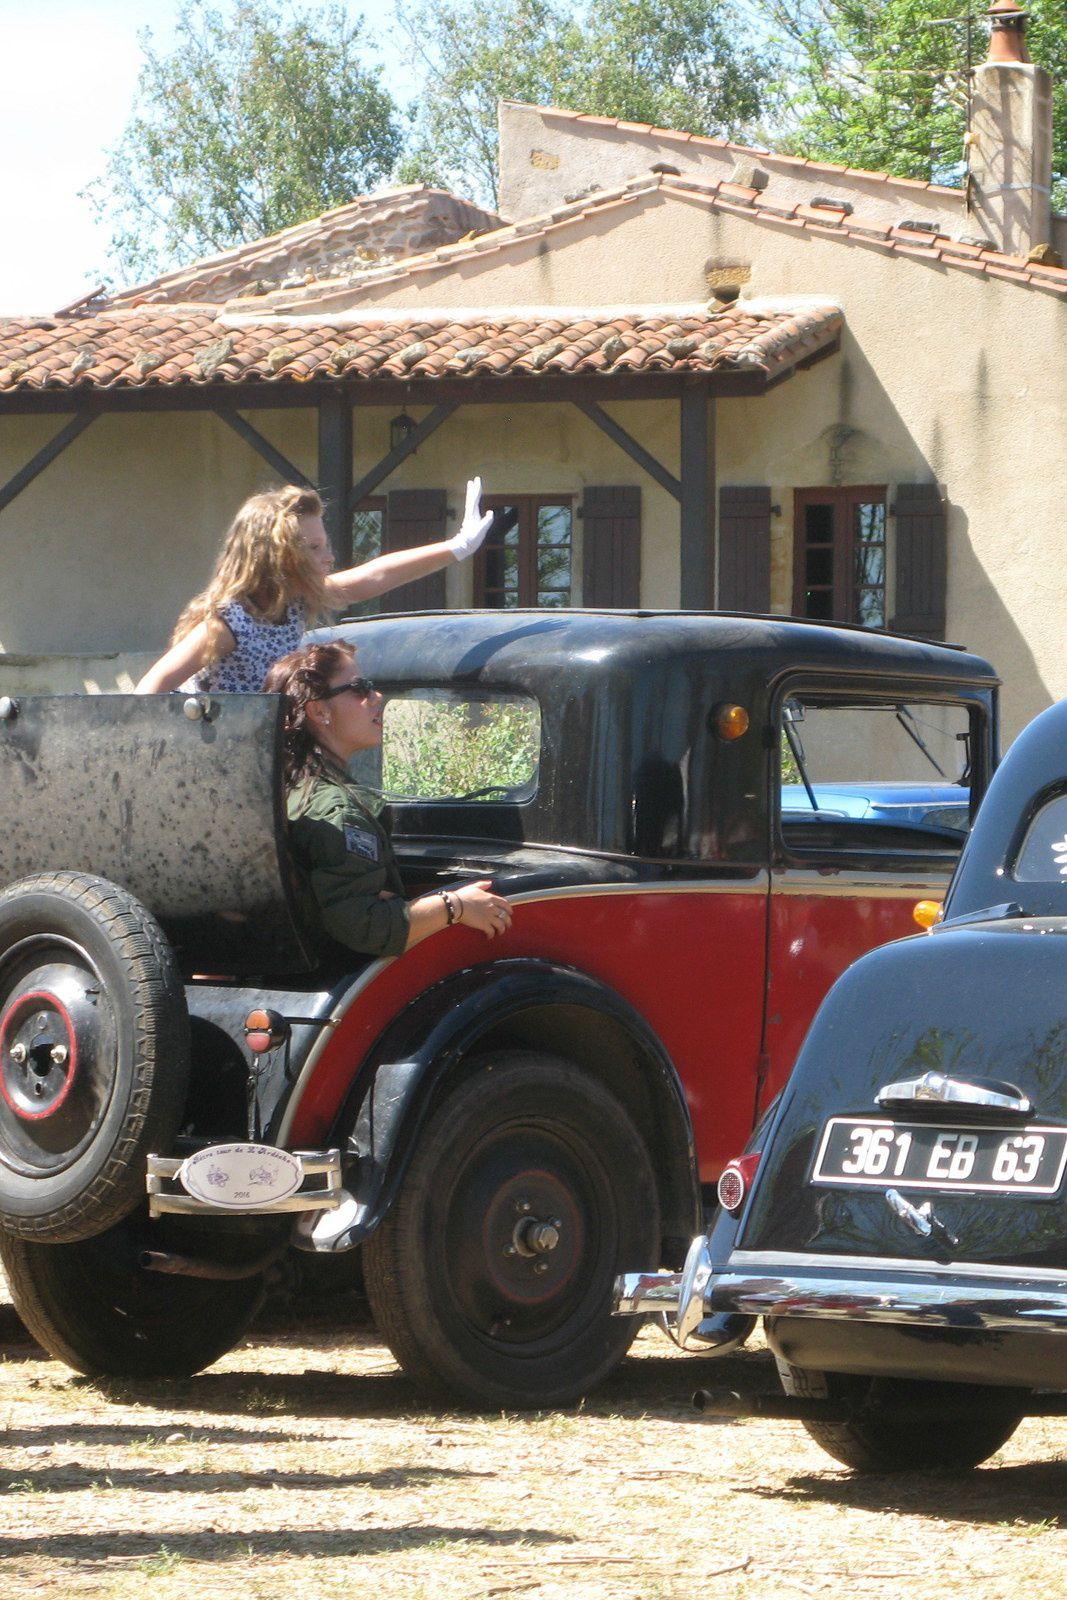 voitures anciennes collection -blog charlotteblabla